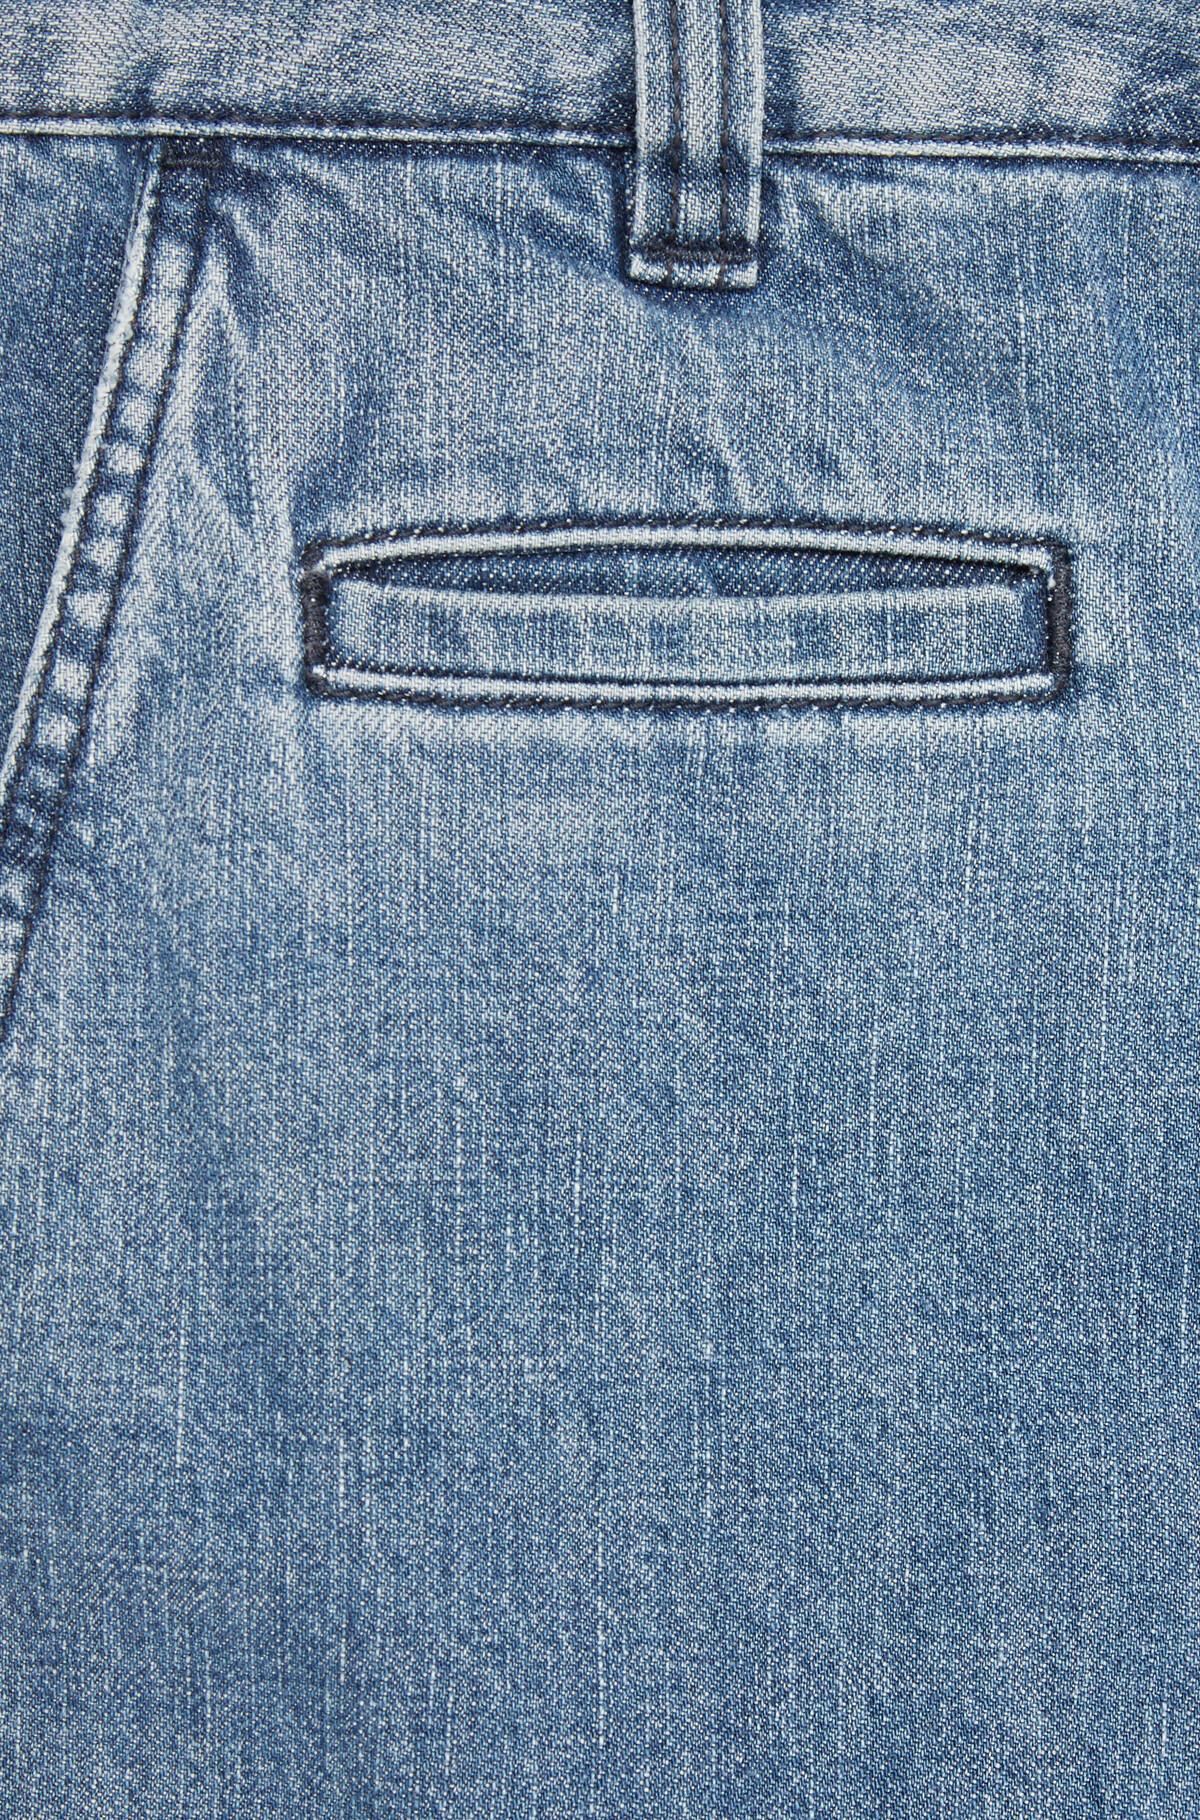 LOEWE Fisherman Jeans Blue front